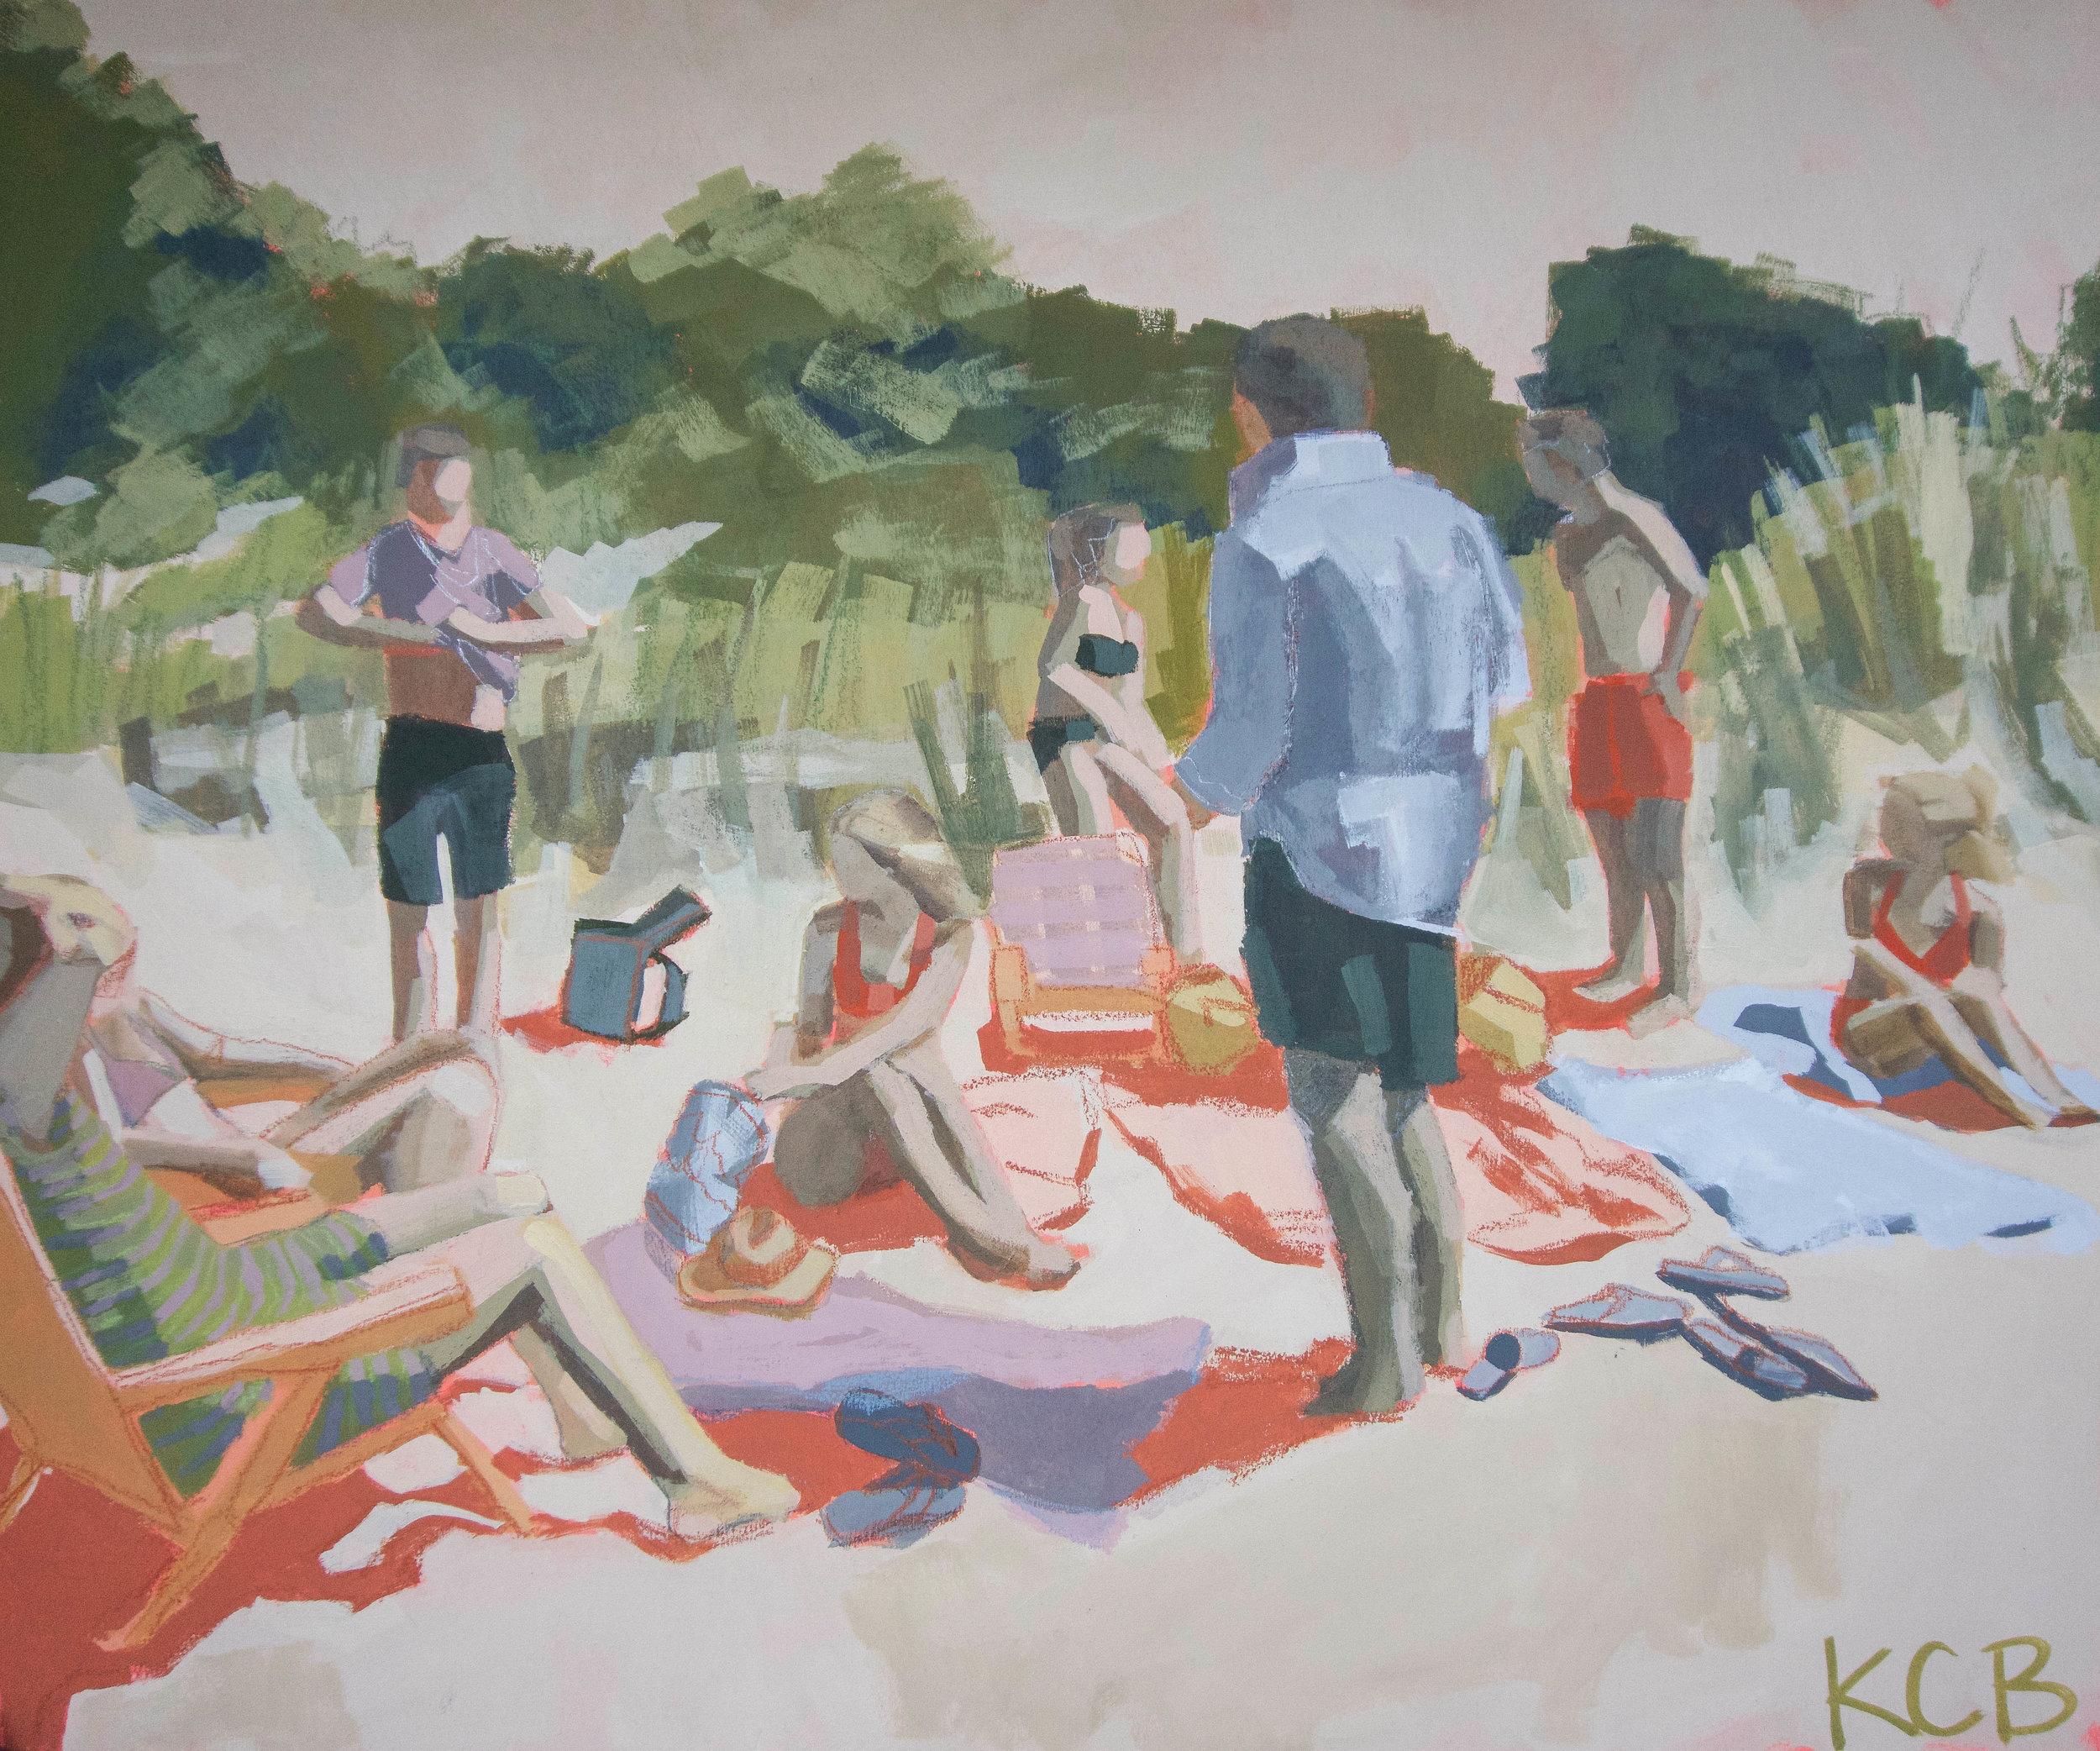 Katherine Corden_Summer School 20x24_Lake Lovers.jpg